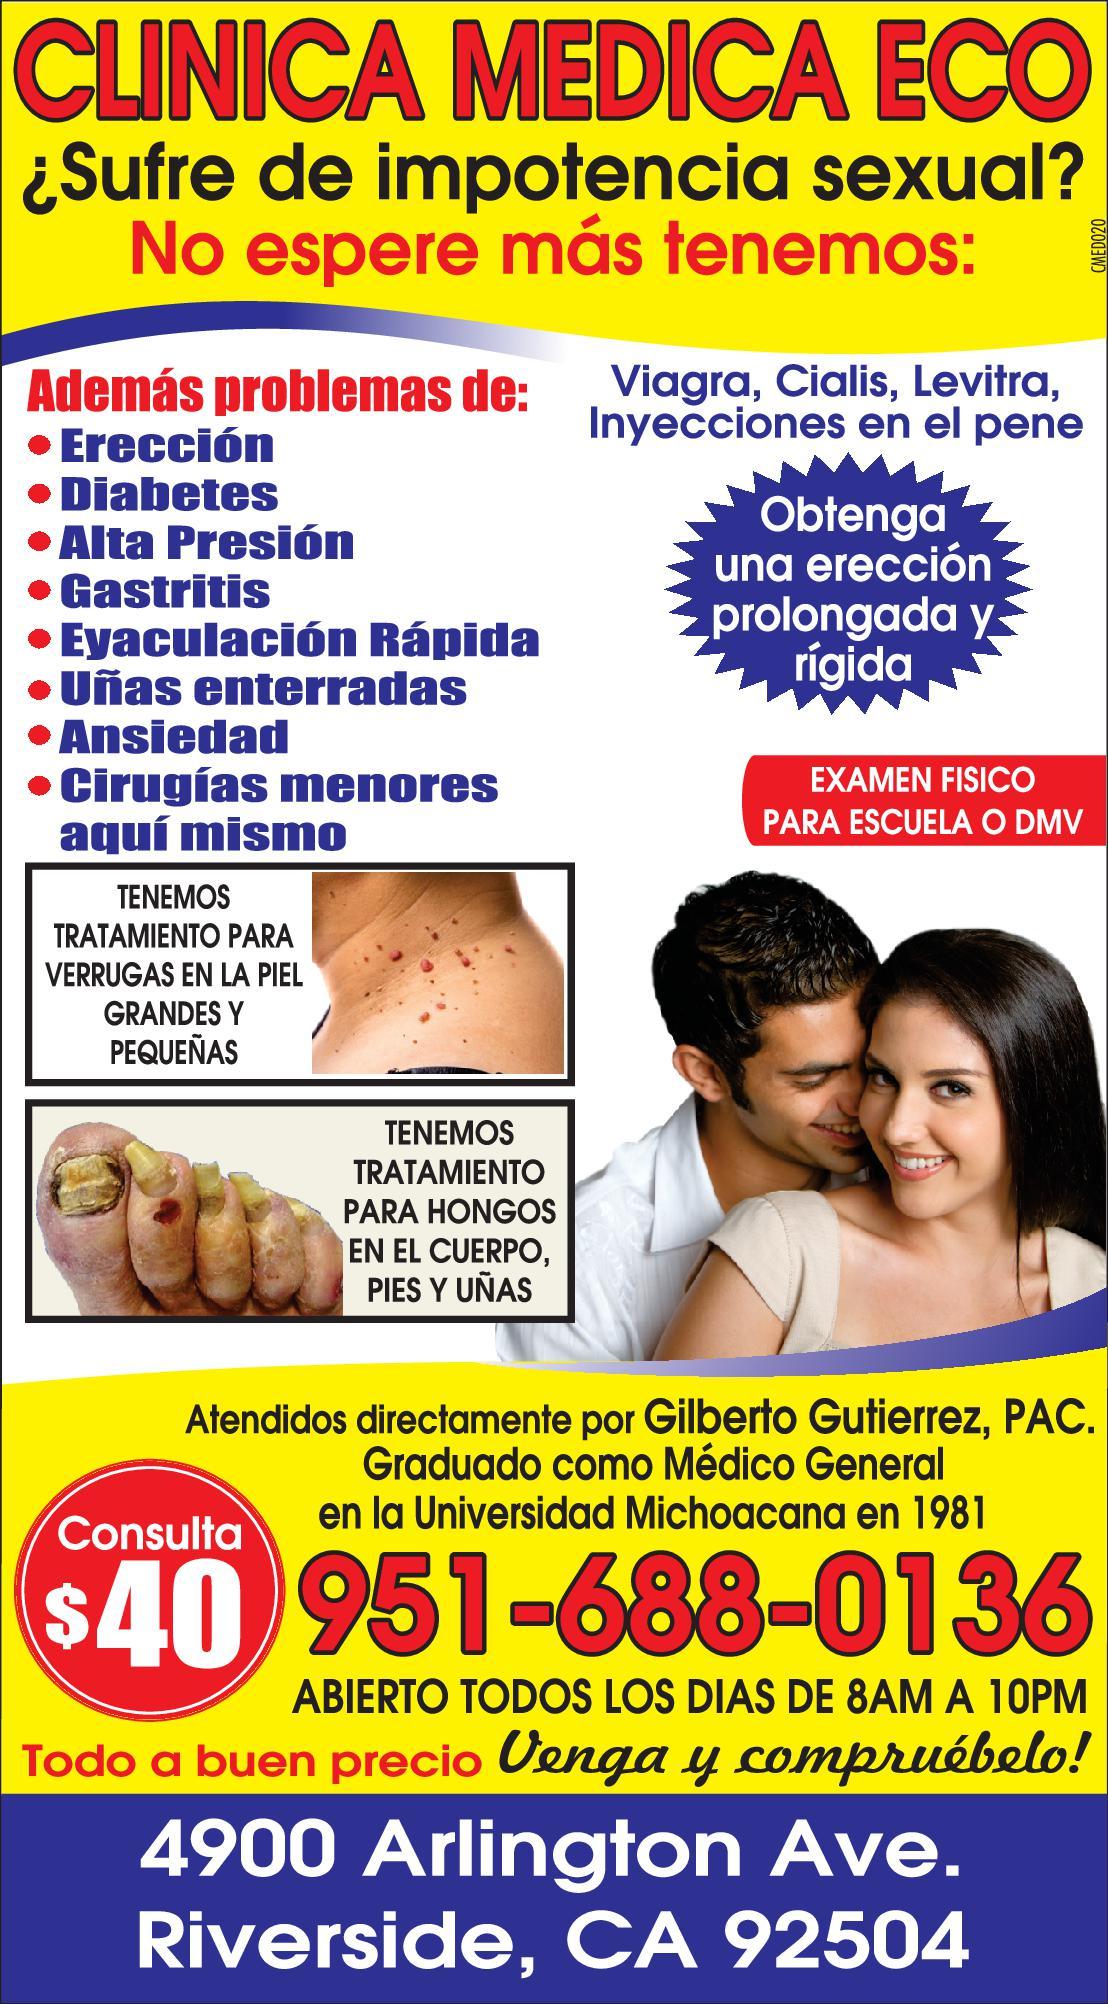 Clinica Medica Eco